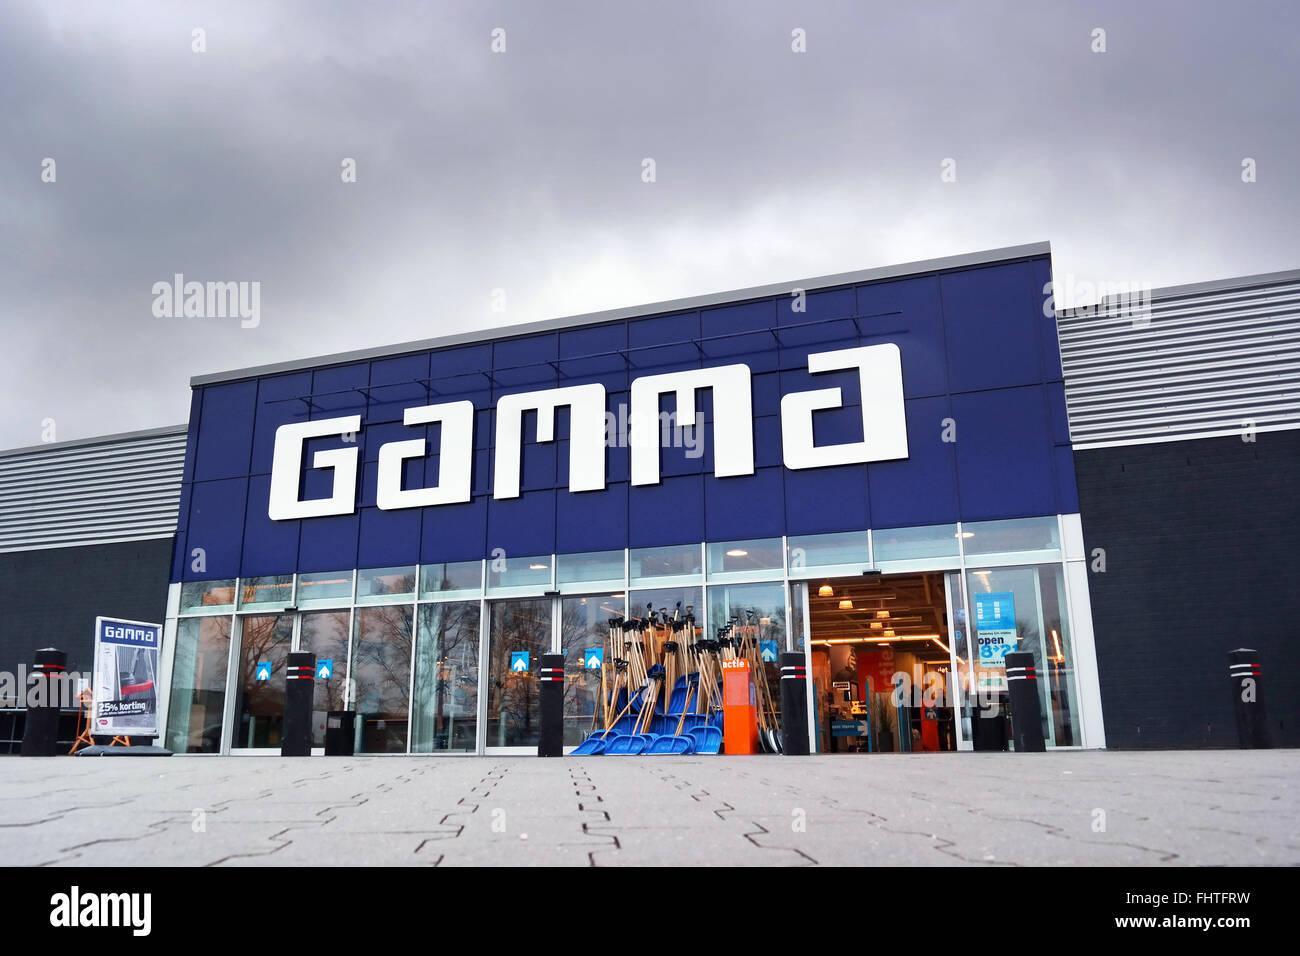 Branch of gamma do it yourself centre stock photo royalty free branch of gamma do it yourself centre solutioingenieria Choice Image